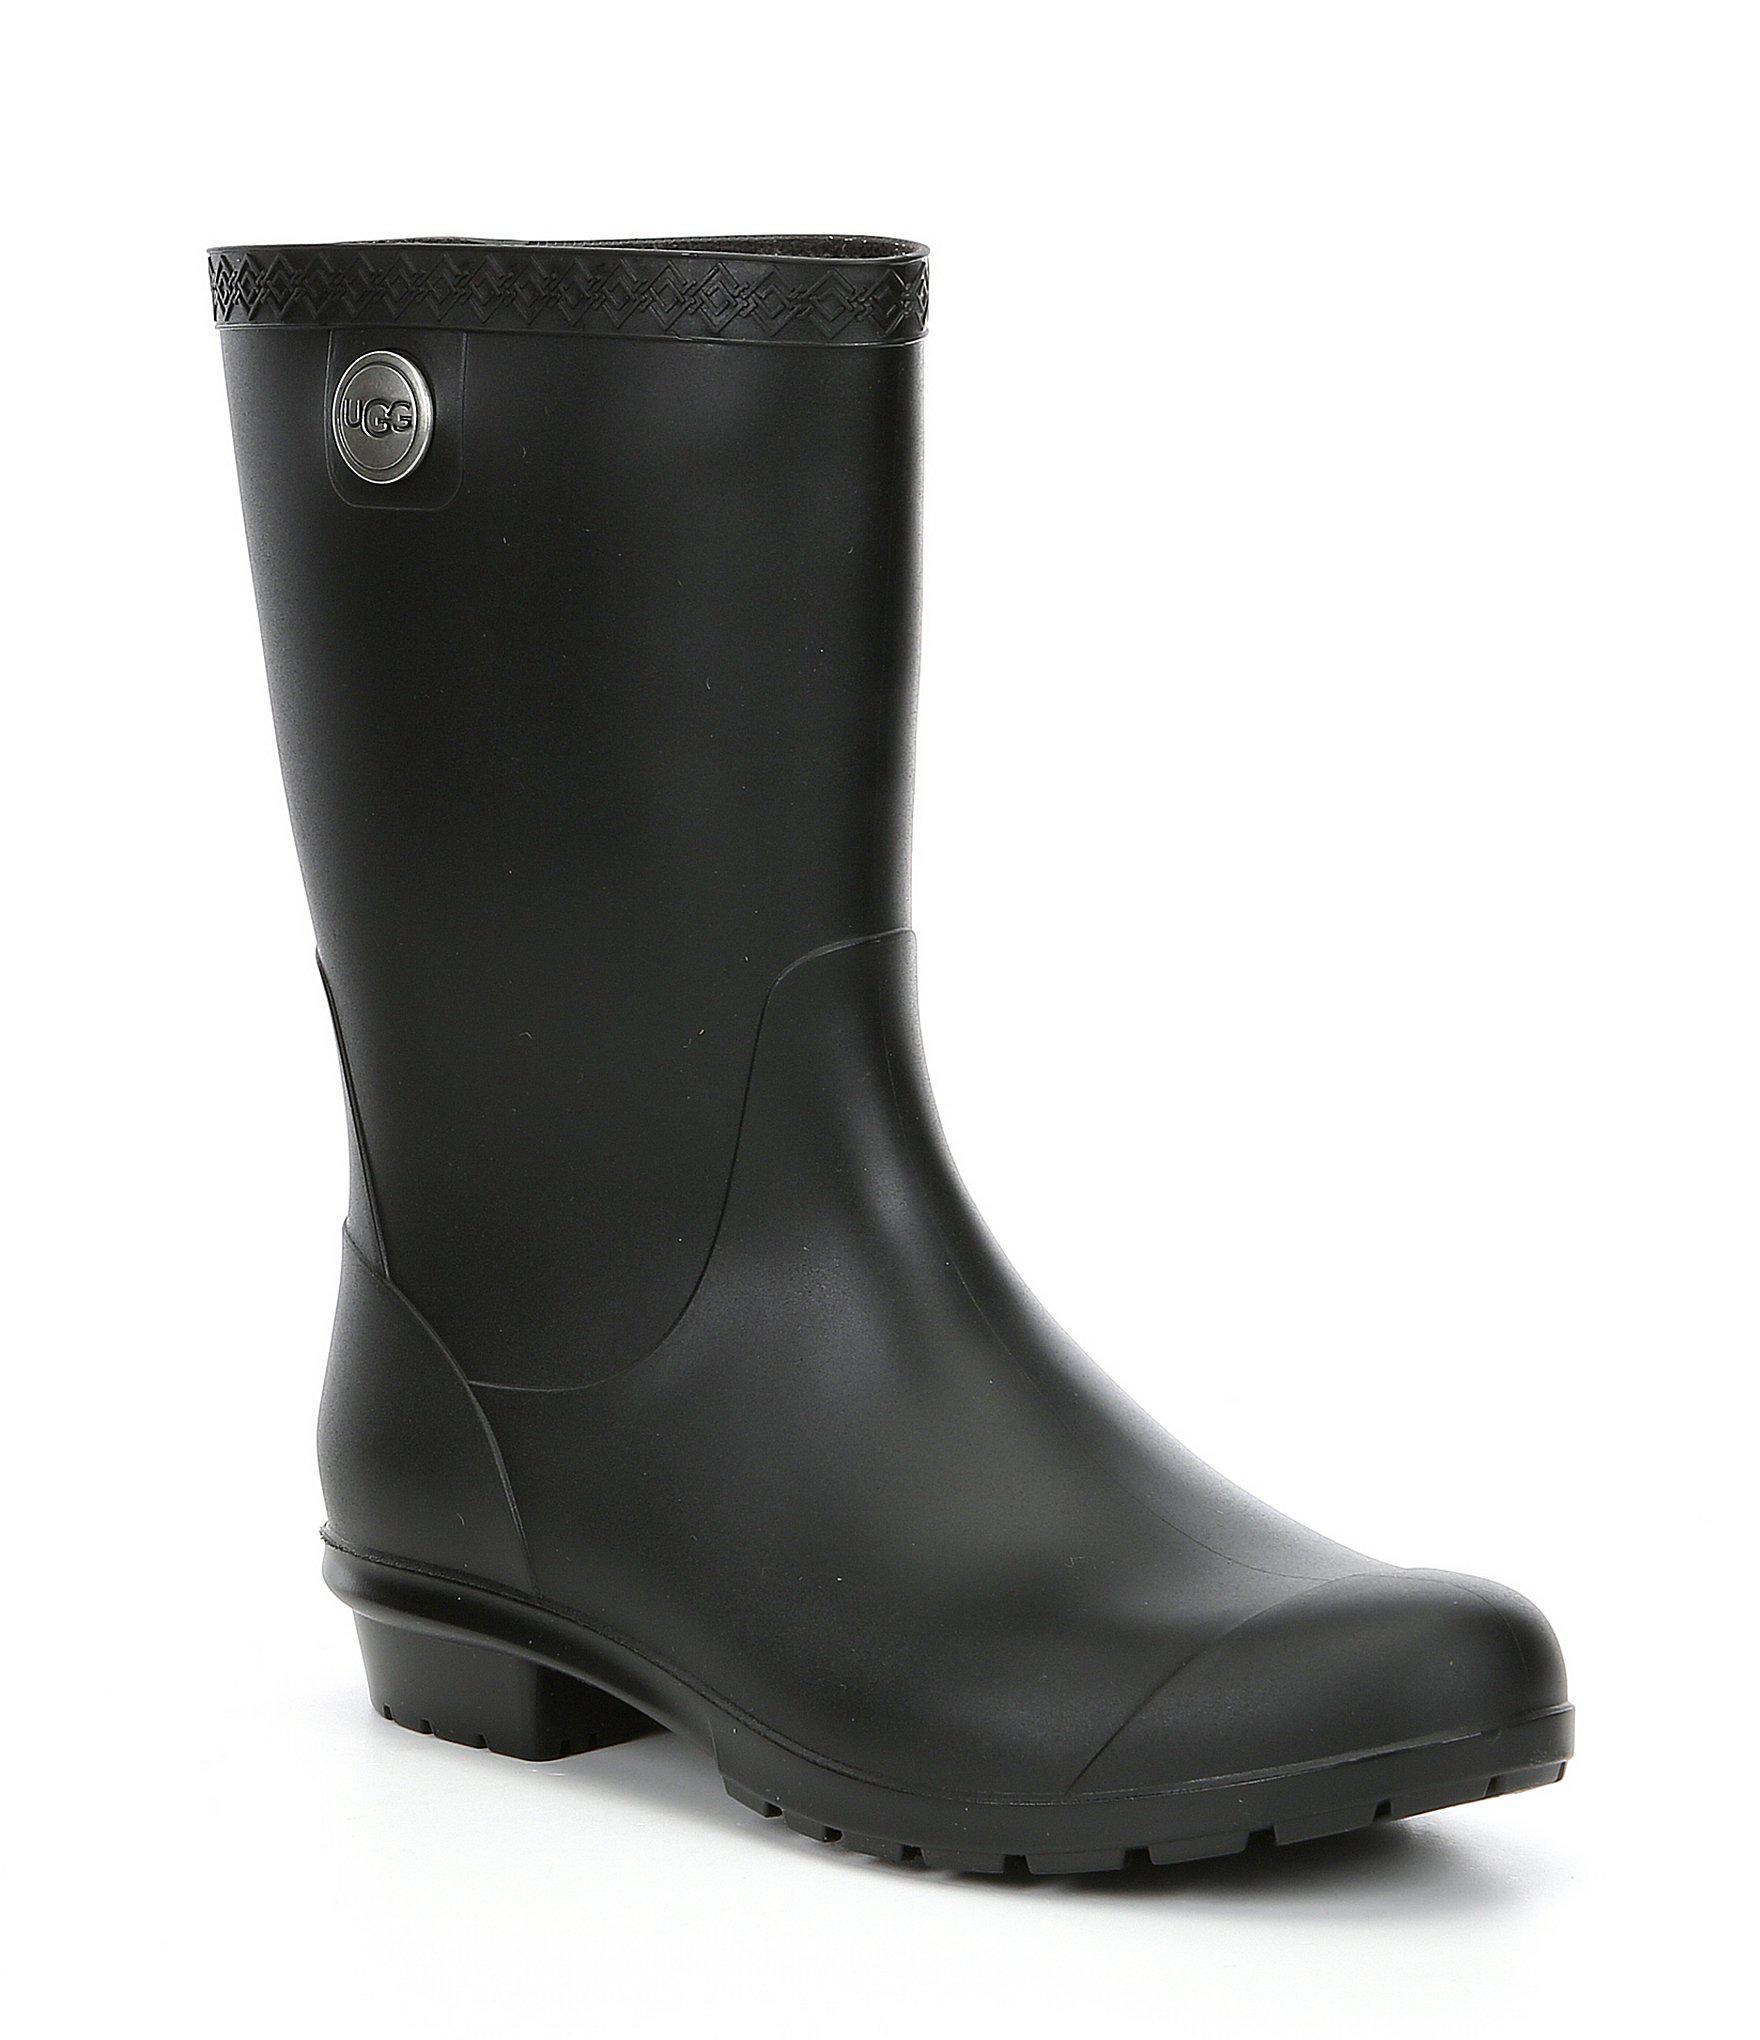 e91e1a93b46 Ugg Black Sienna Matte Shearling-lined Boots